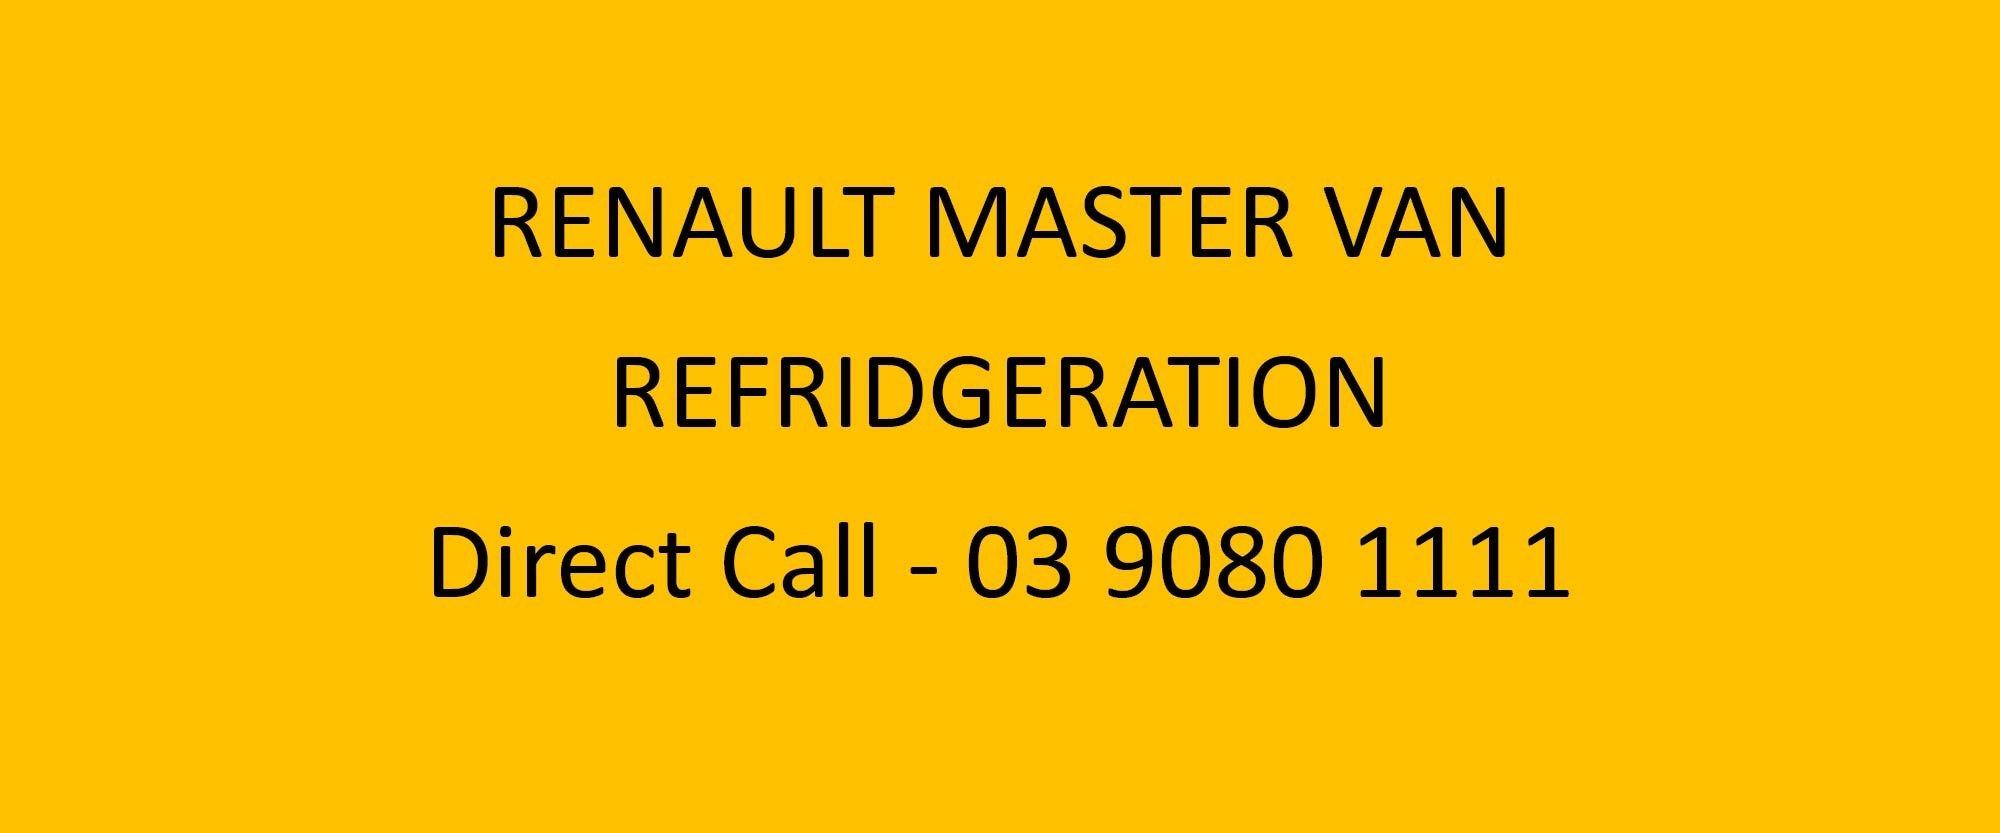 Renault Master Van Refridgeration